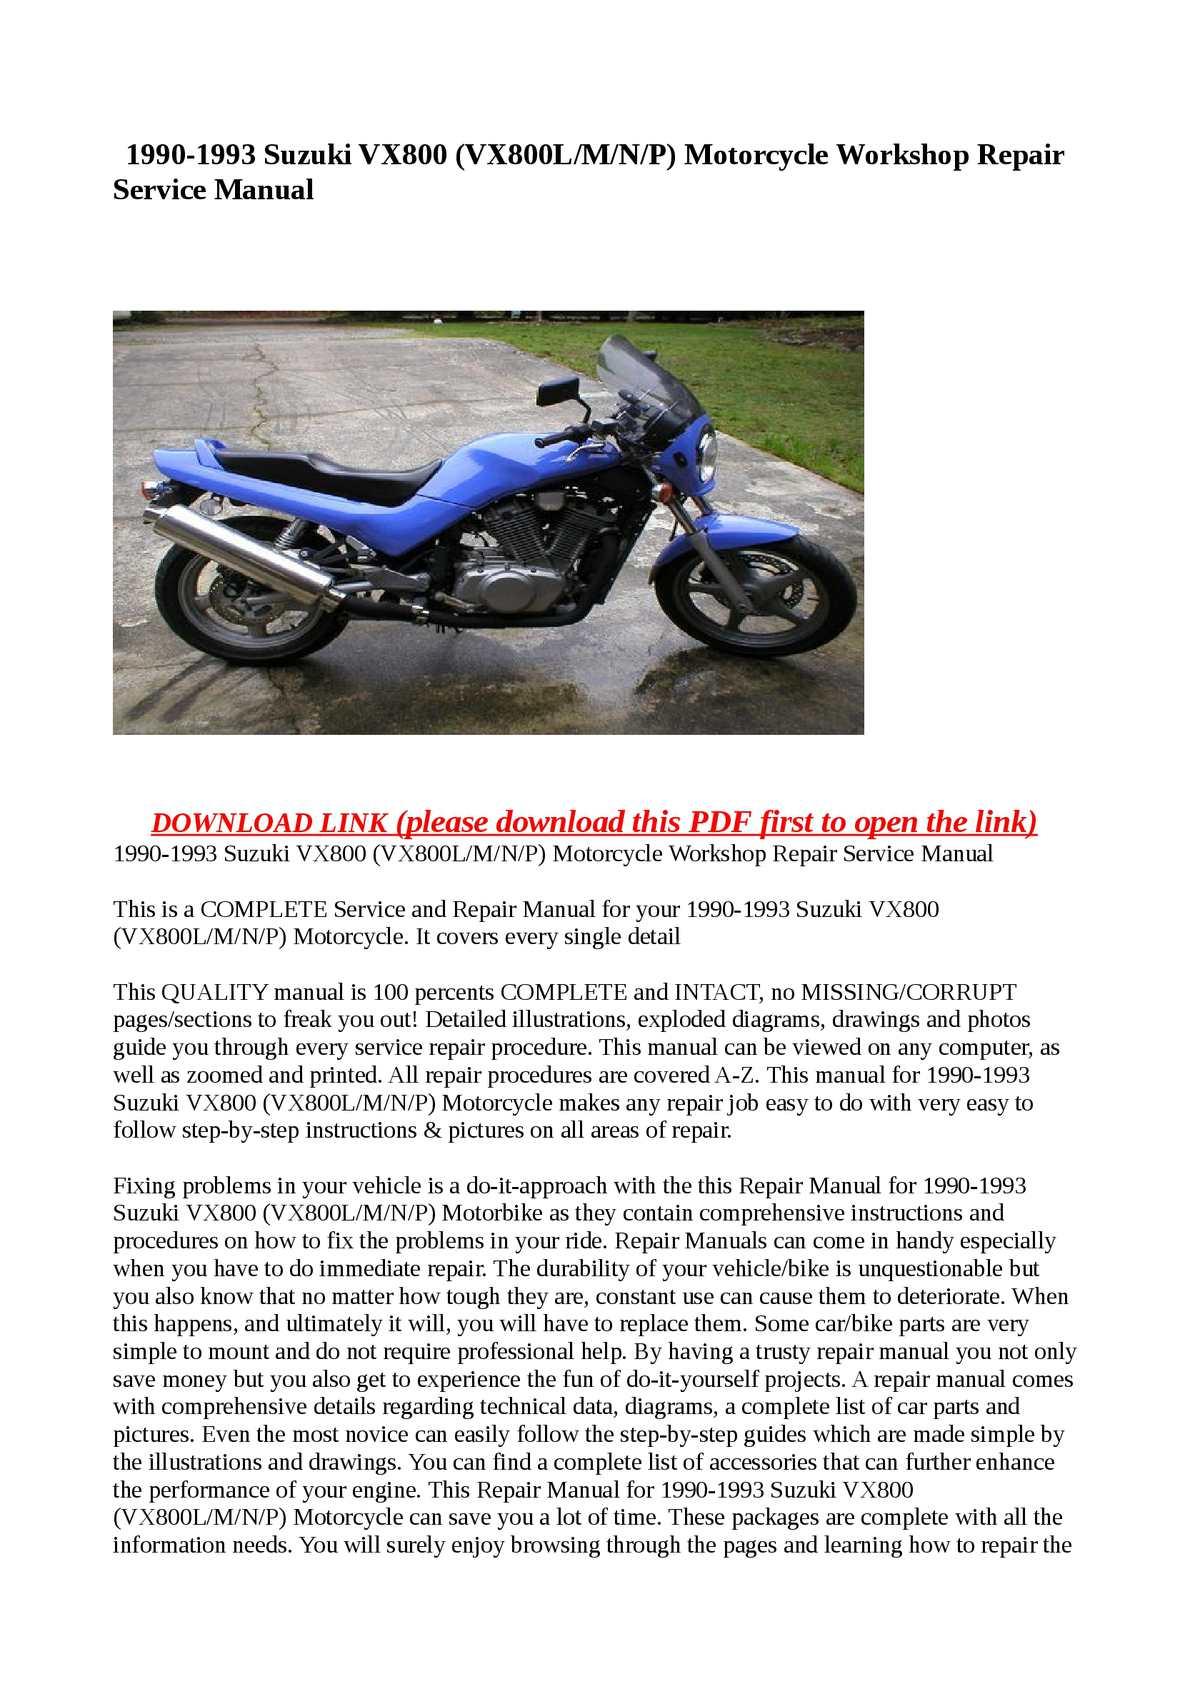 Calameo 1990 1993 Suzuki Vx800 Vx800l M N P Motorcycle Workshop Repair Service Manual